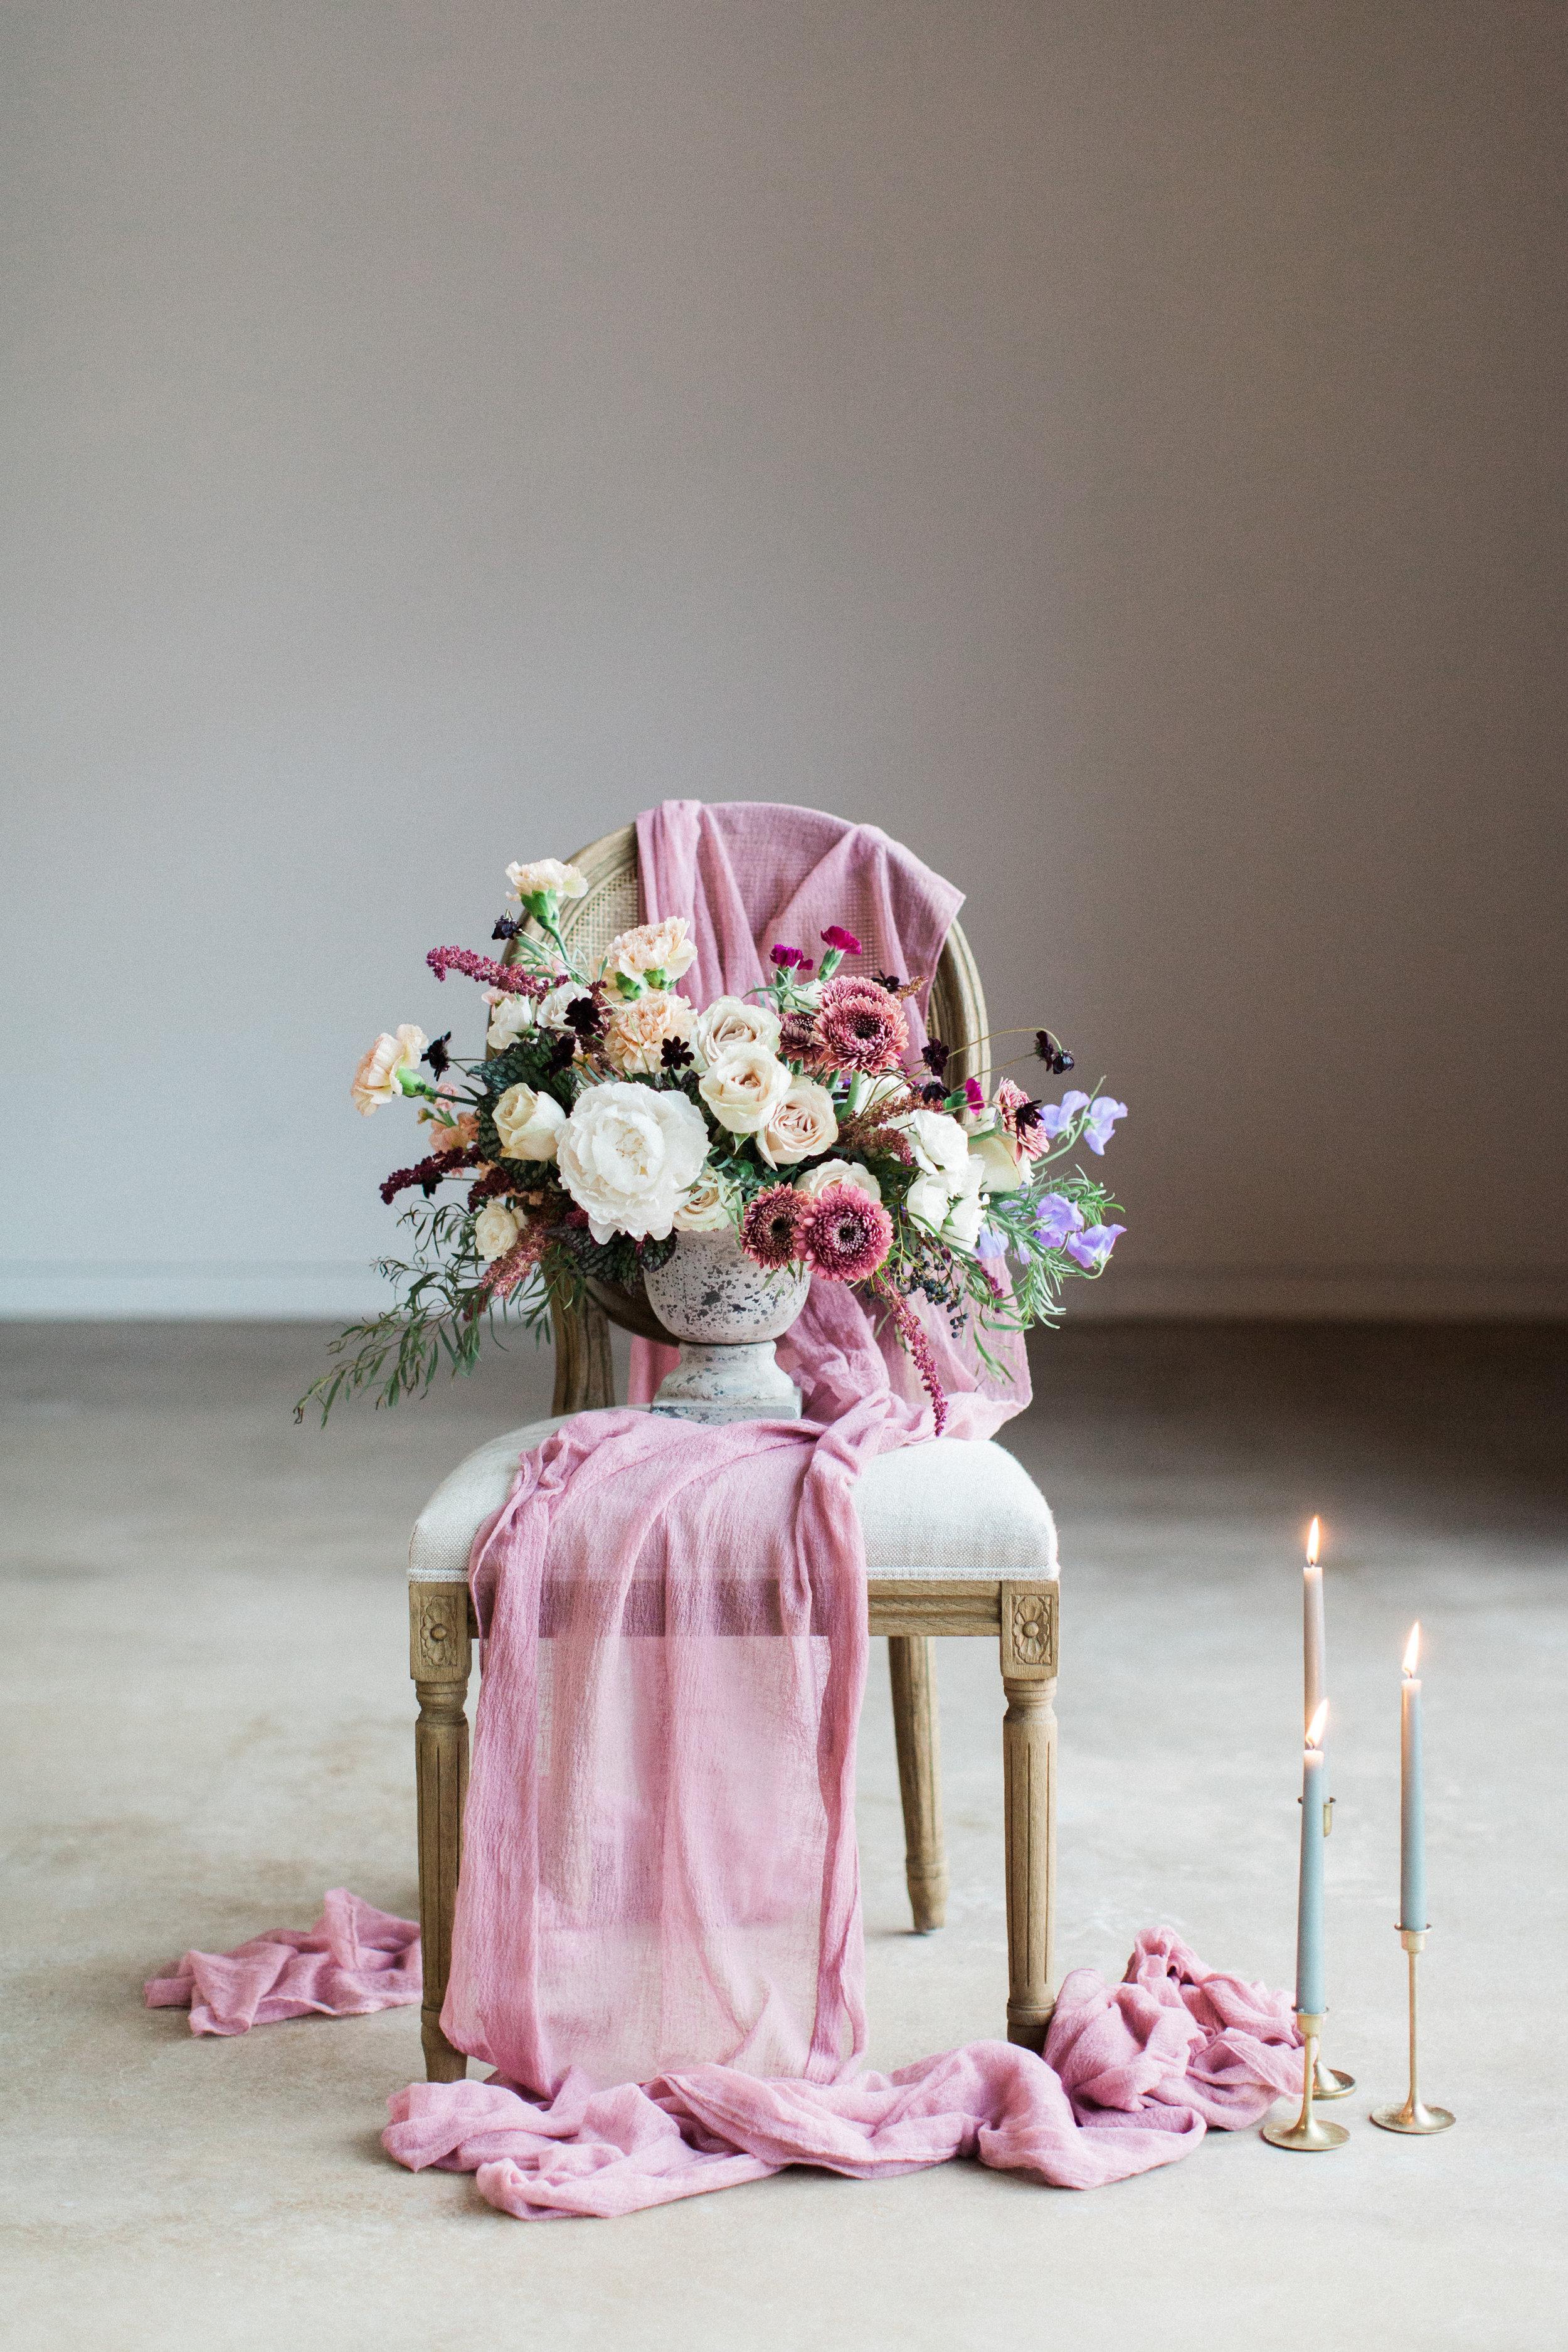 Mauve and Lavender Modern Wedding Inspiration - Flower Centerpiece